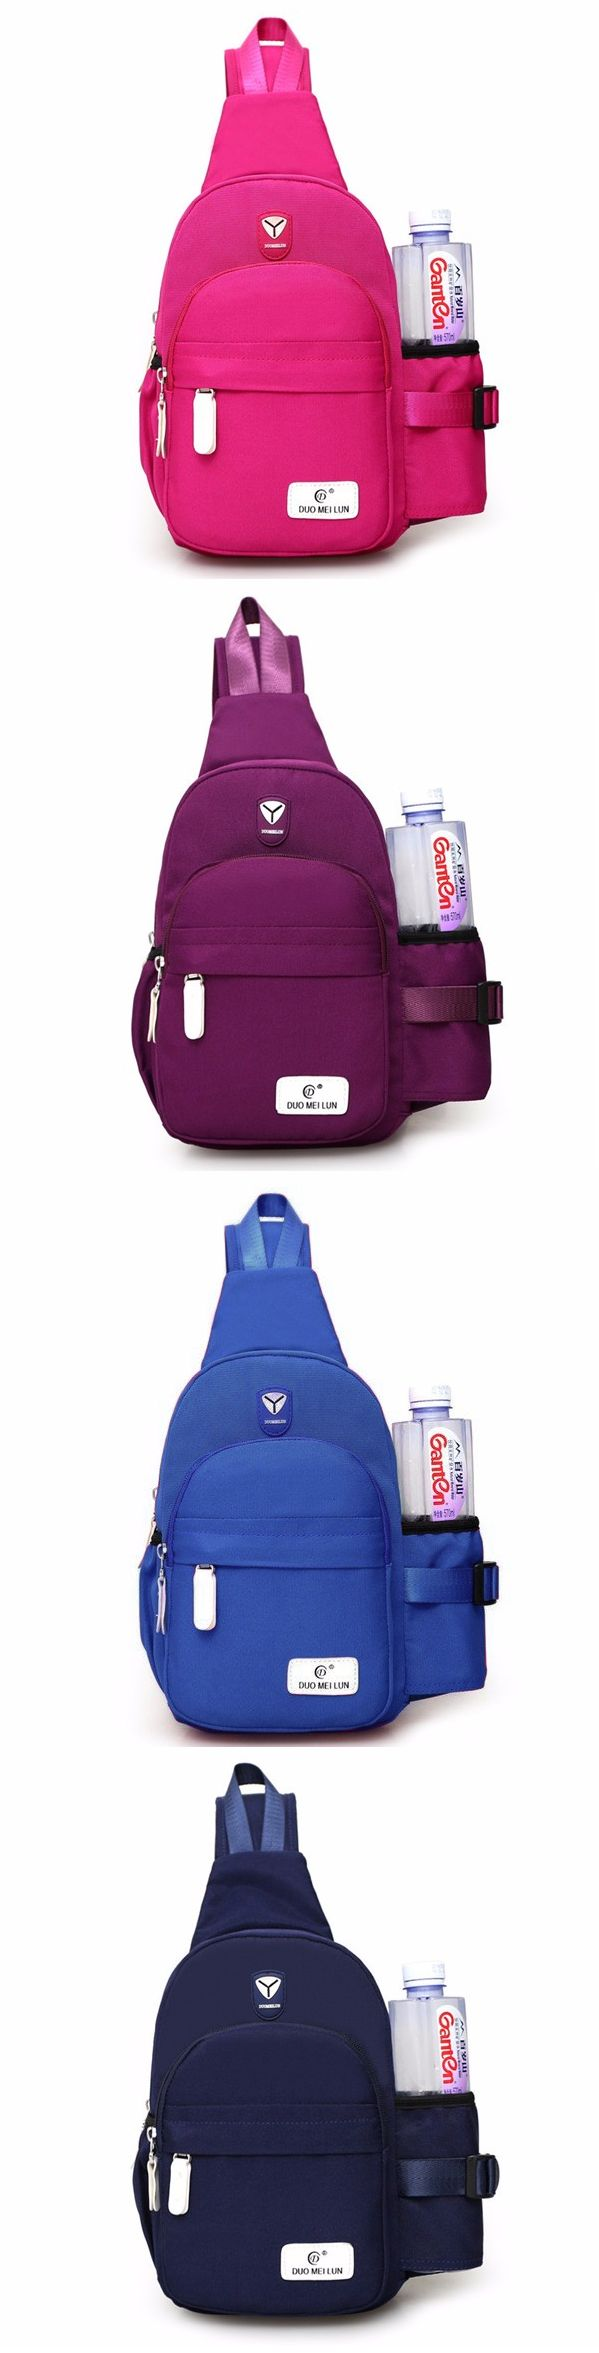 Women Nylon Daily Crossbody Bag Waterproof Durable Chest Bag Shoulder Bag https://twitter.com/gaefaefagaea4/status/895099981215932416